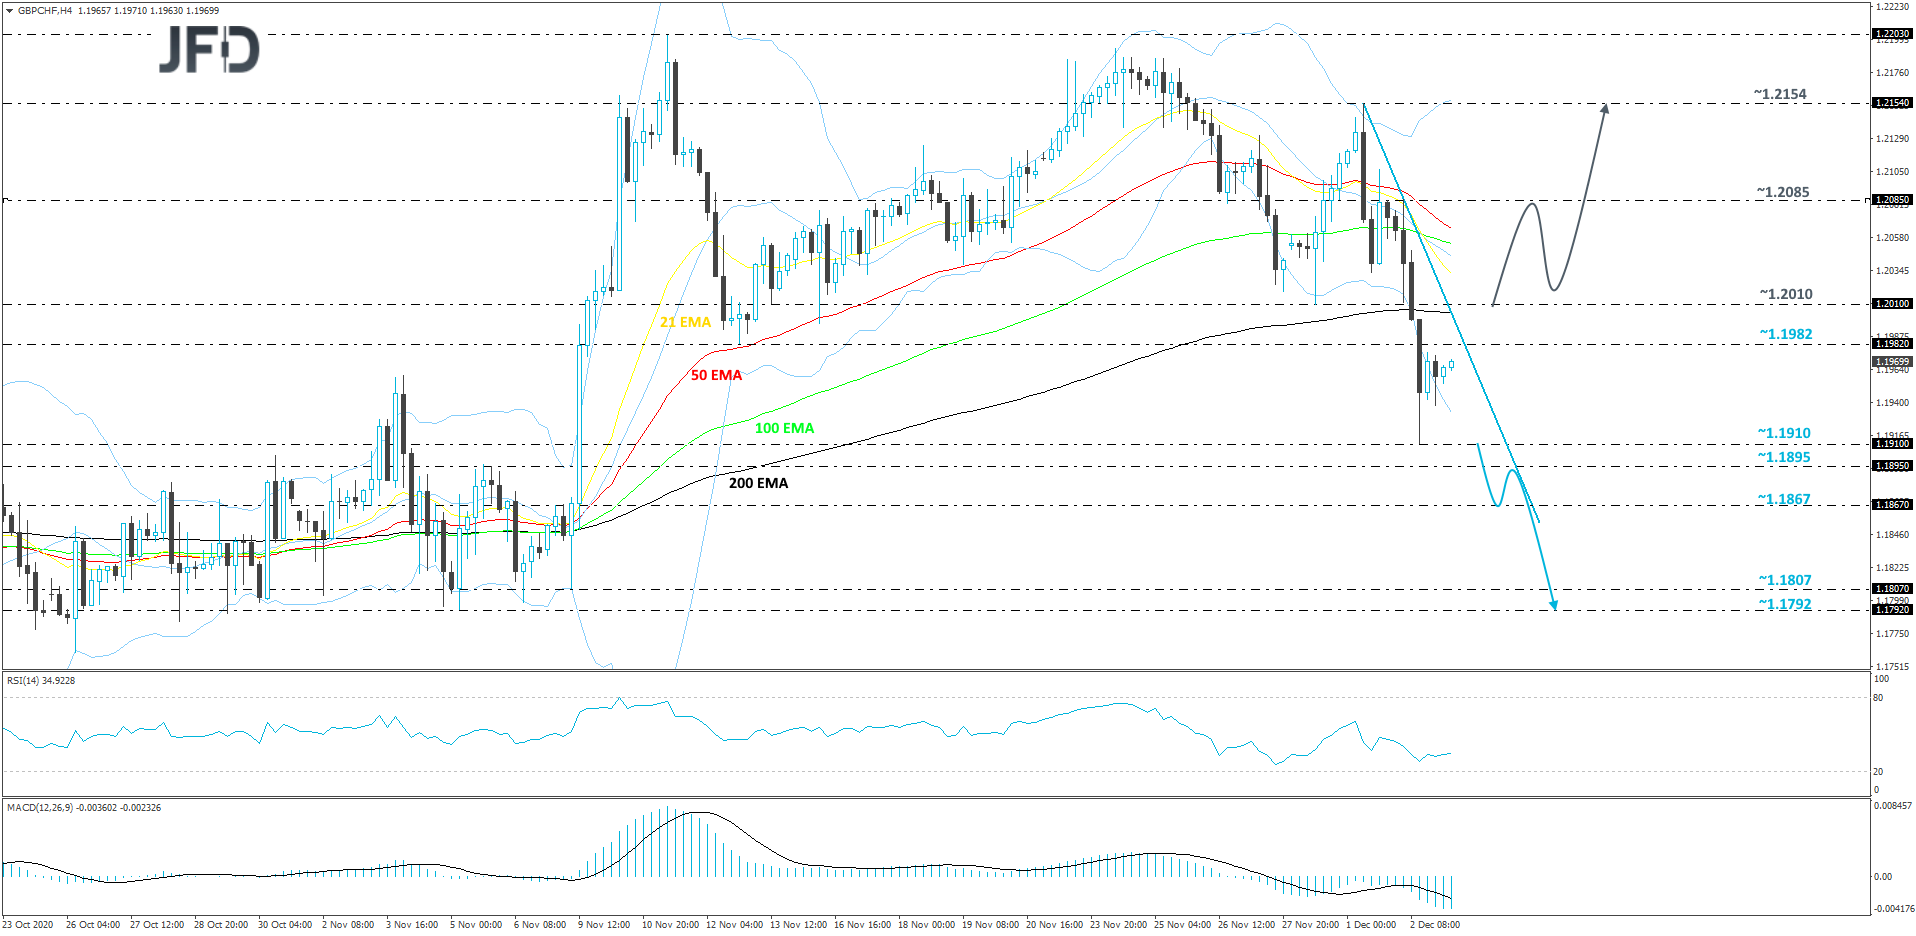 GBP/CHF 4-hour chart technical analysis